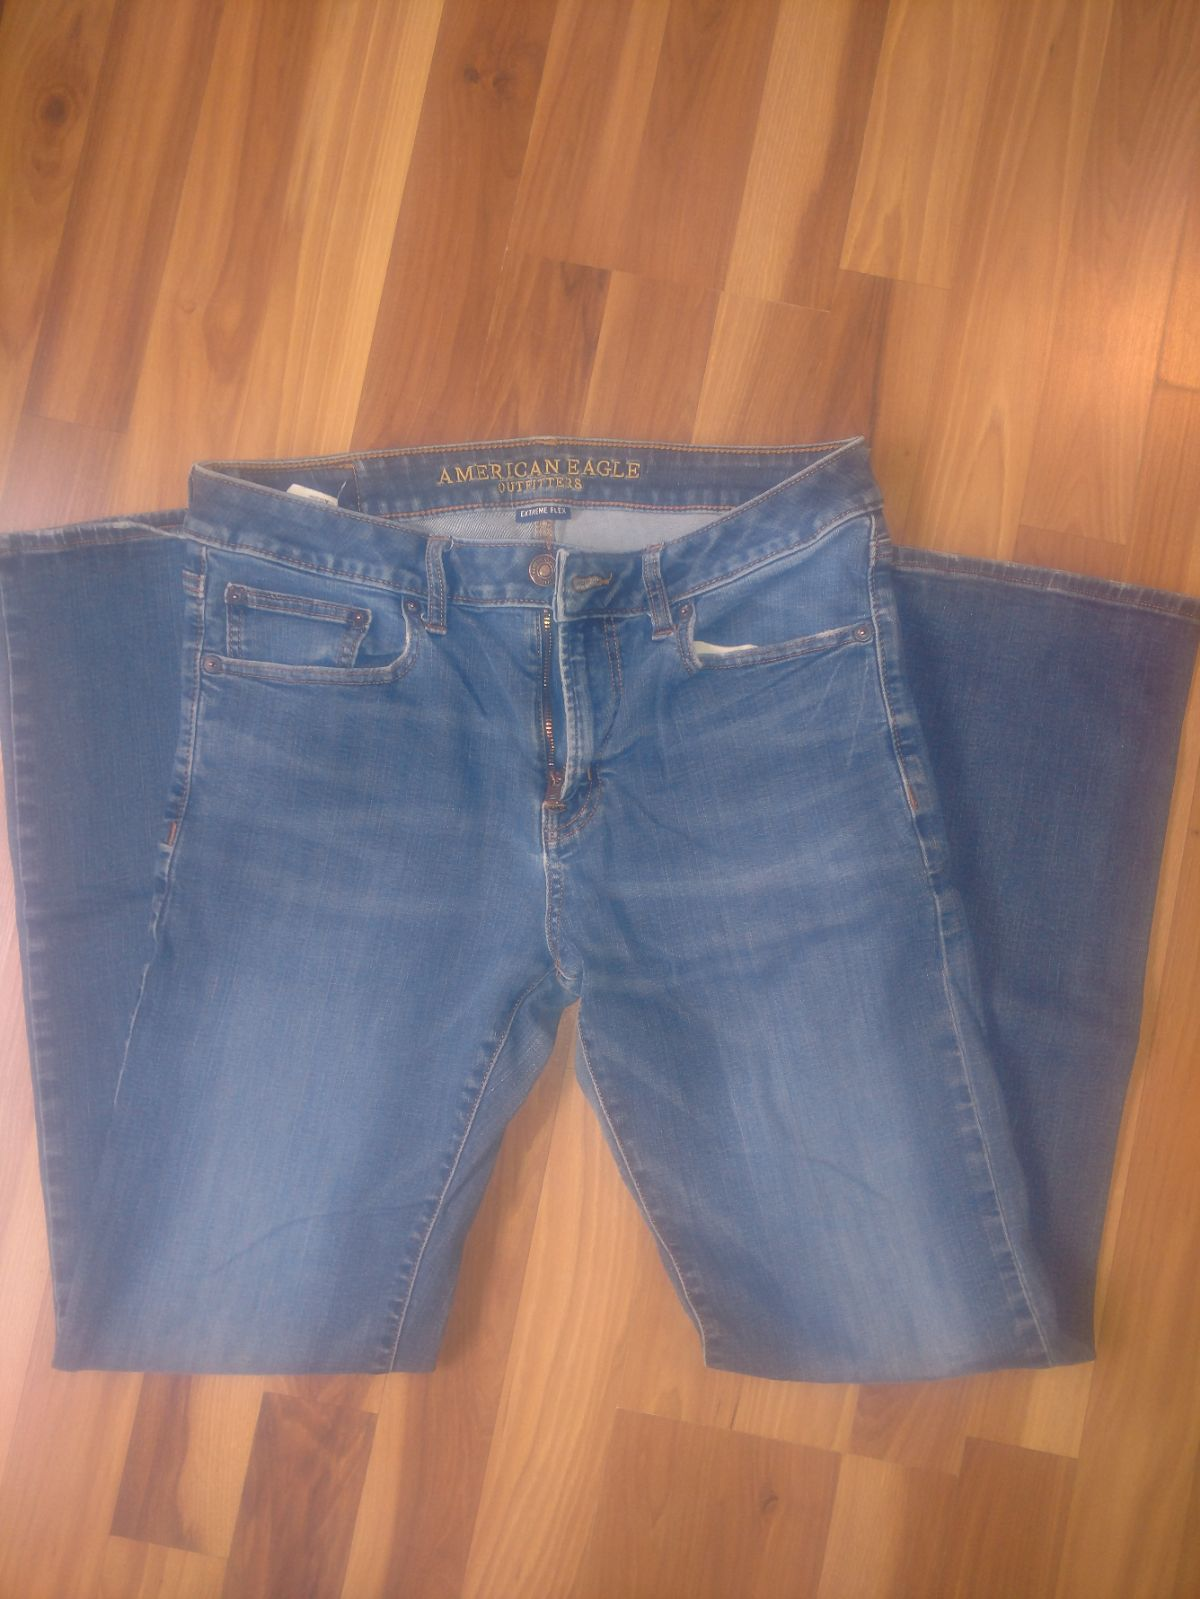 American Eagle jeans men